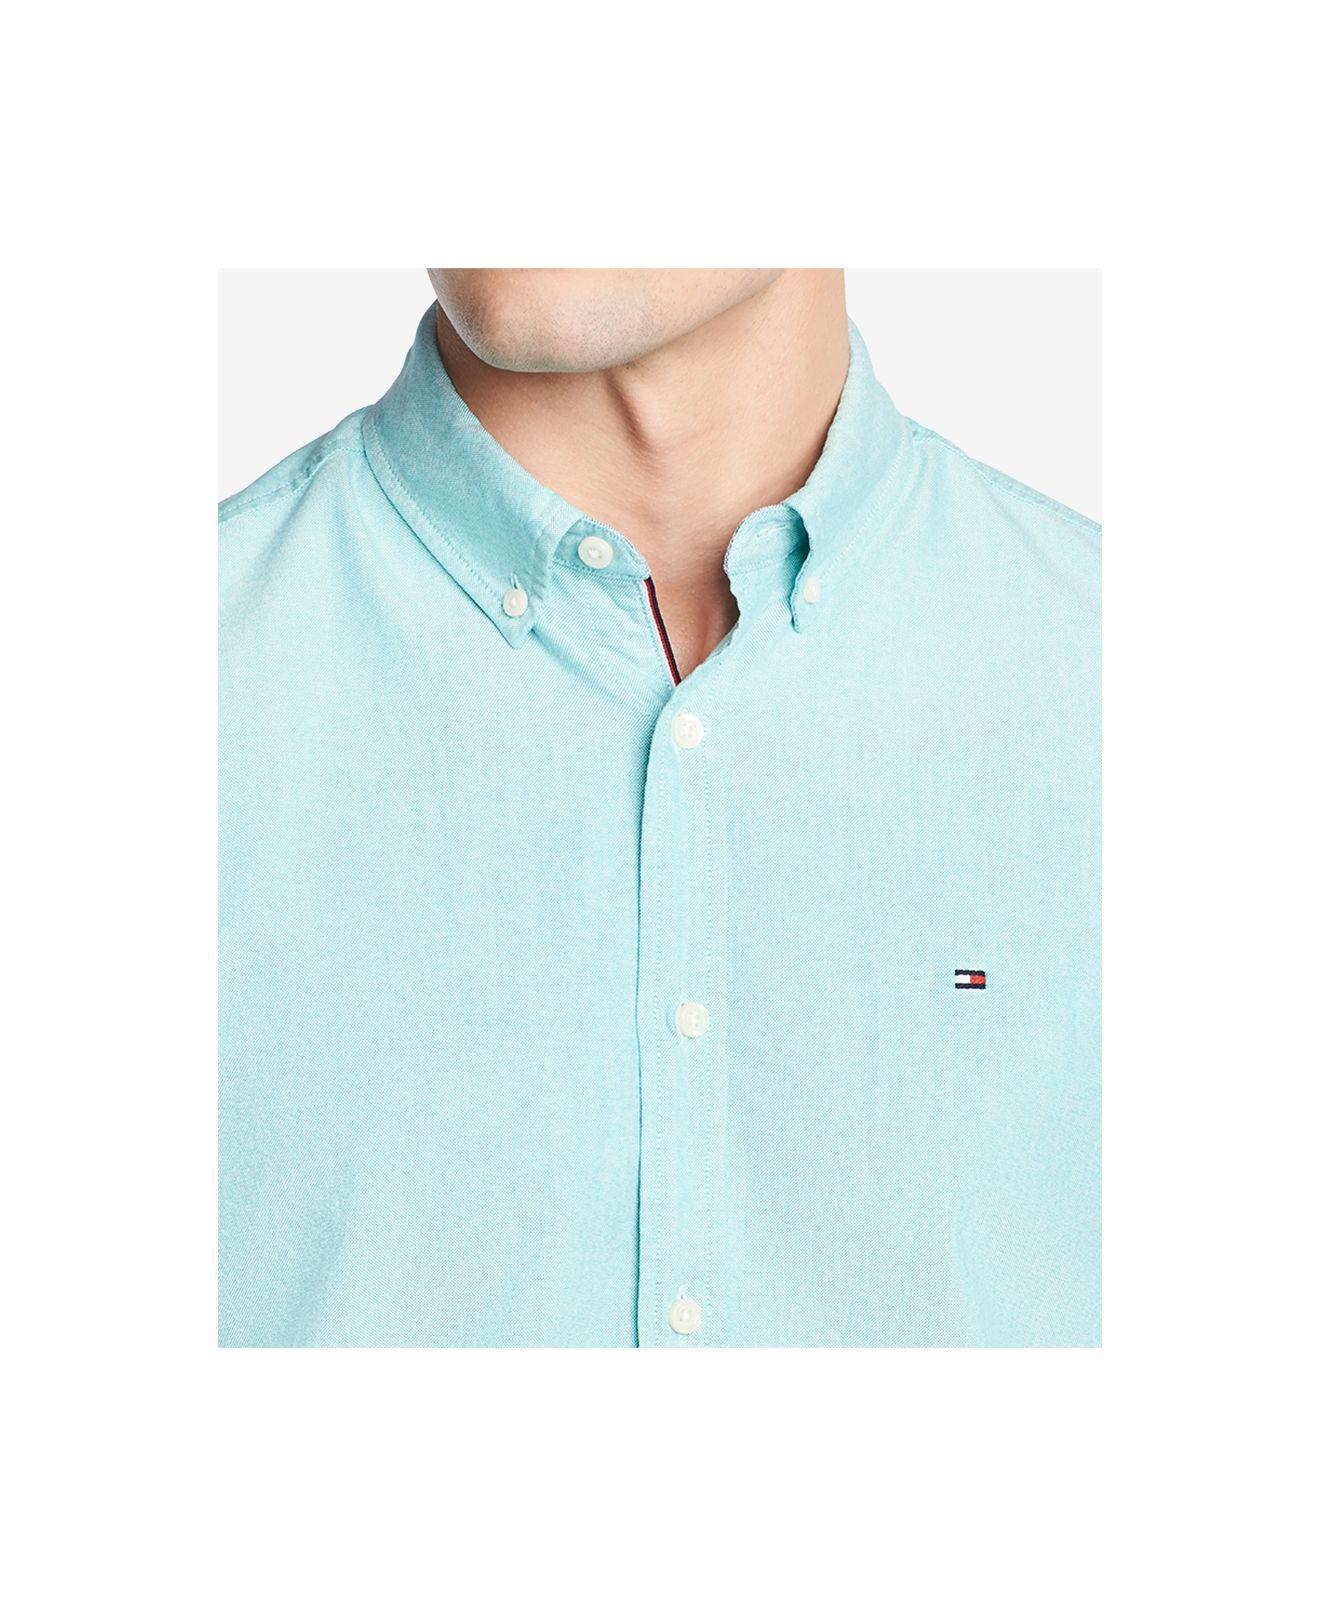 3ada2f4e Lyst - Tommy Hilfiger Custom Fit New England Solid Oxford Shirt ...